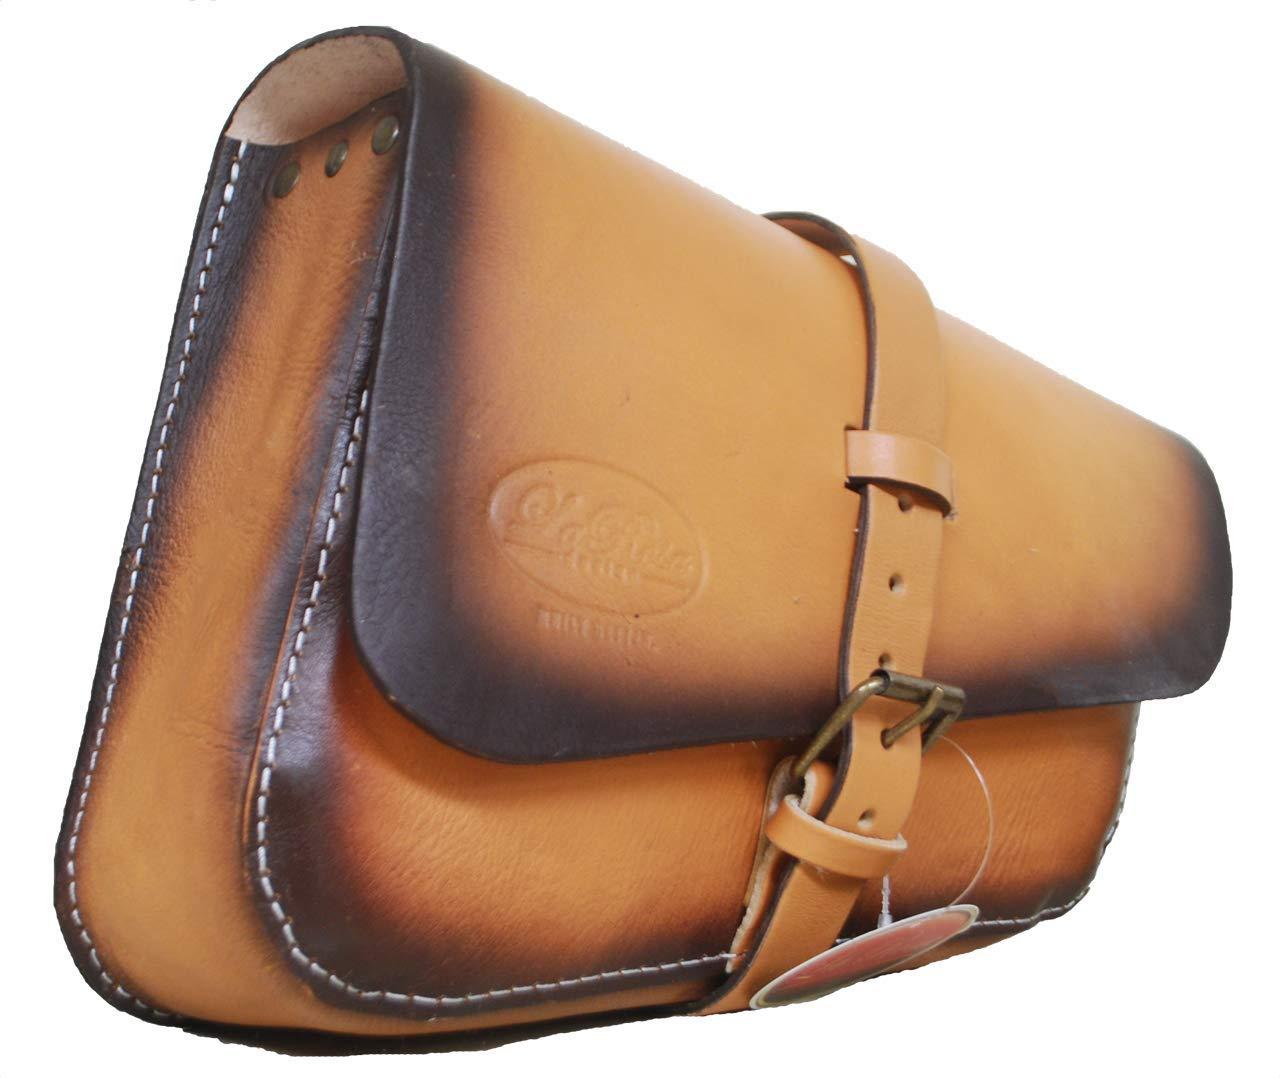 Antique Tan La Rosa Design Left Side Solo Saddle Bag for 2016 /& Up Triumph Bobber